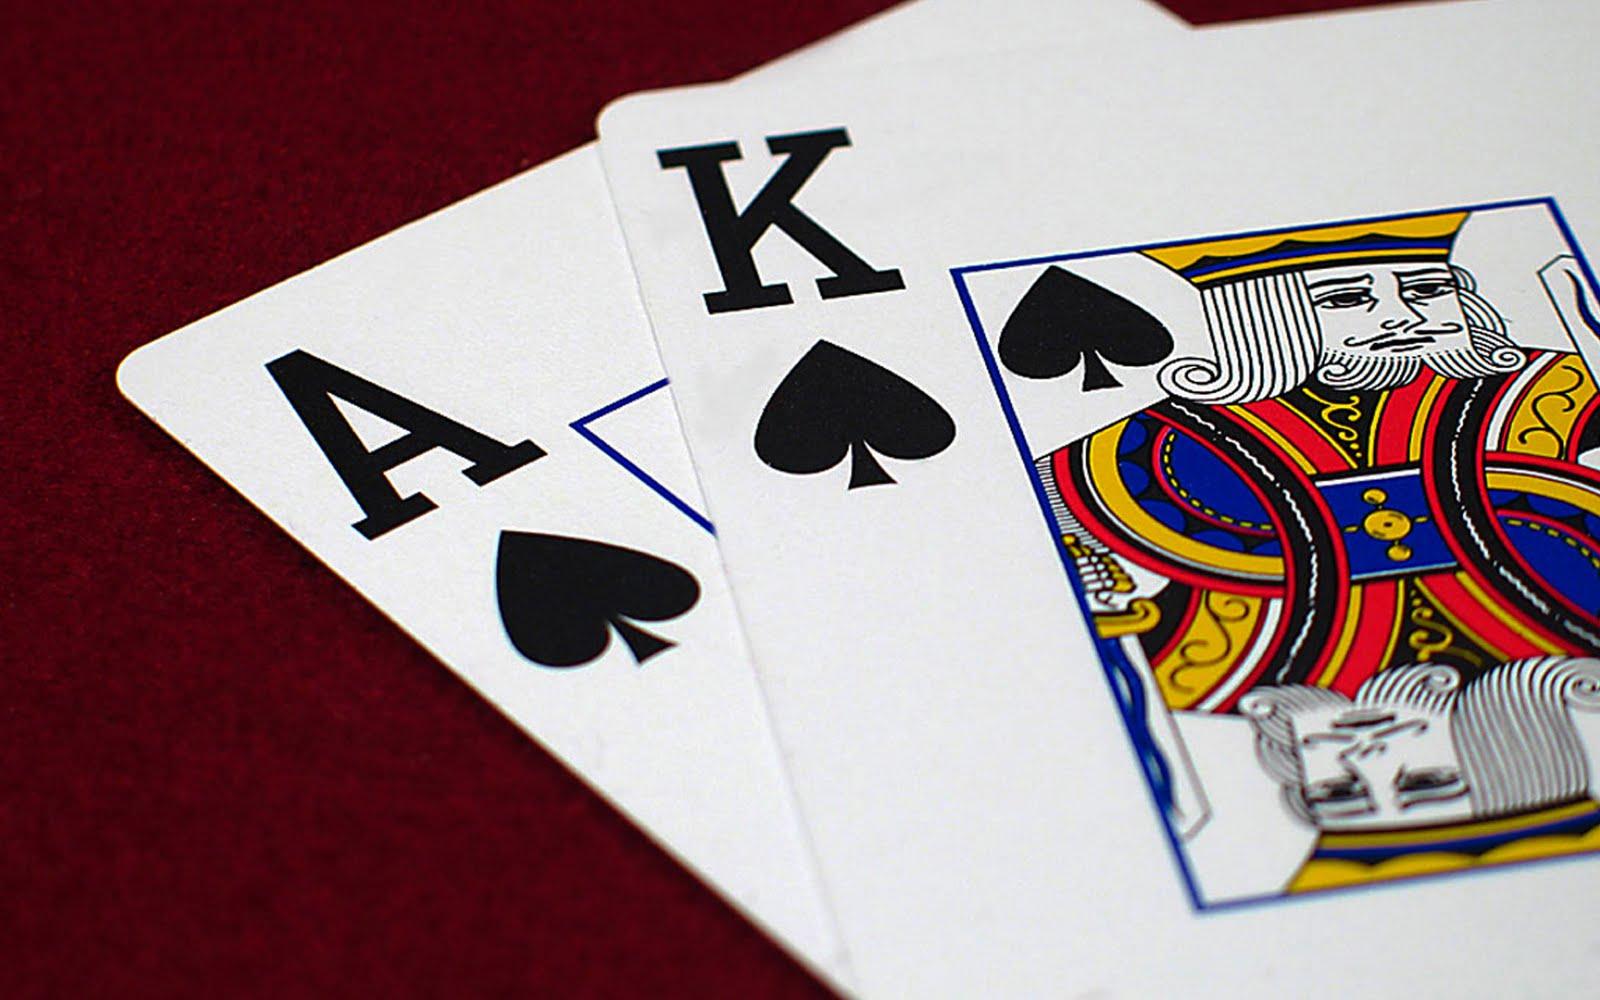 http://www.italiapokerclub.com/wp-content/uploads/2013/02/AK.jpg